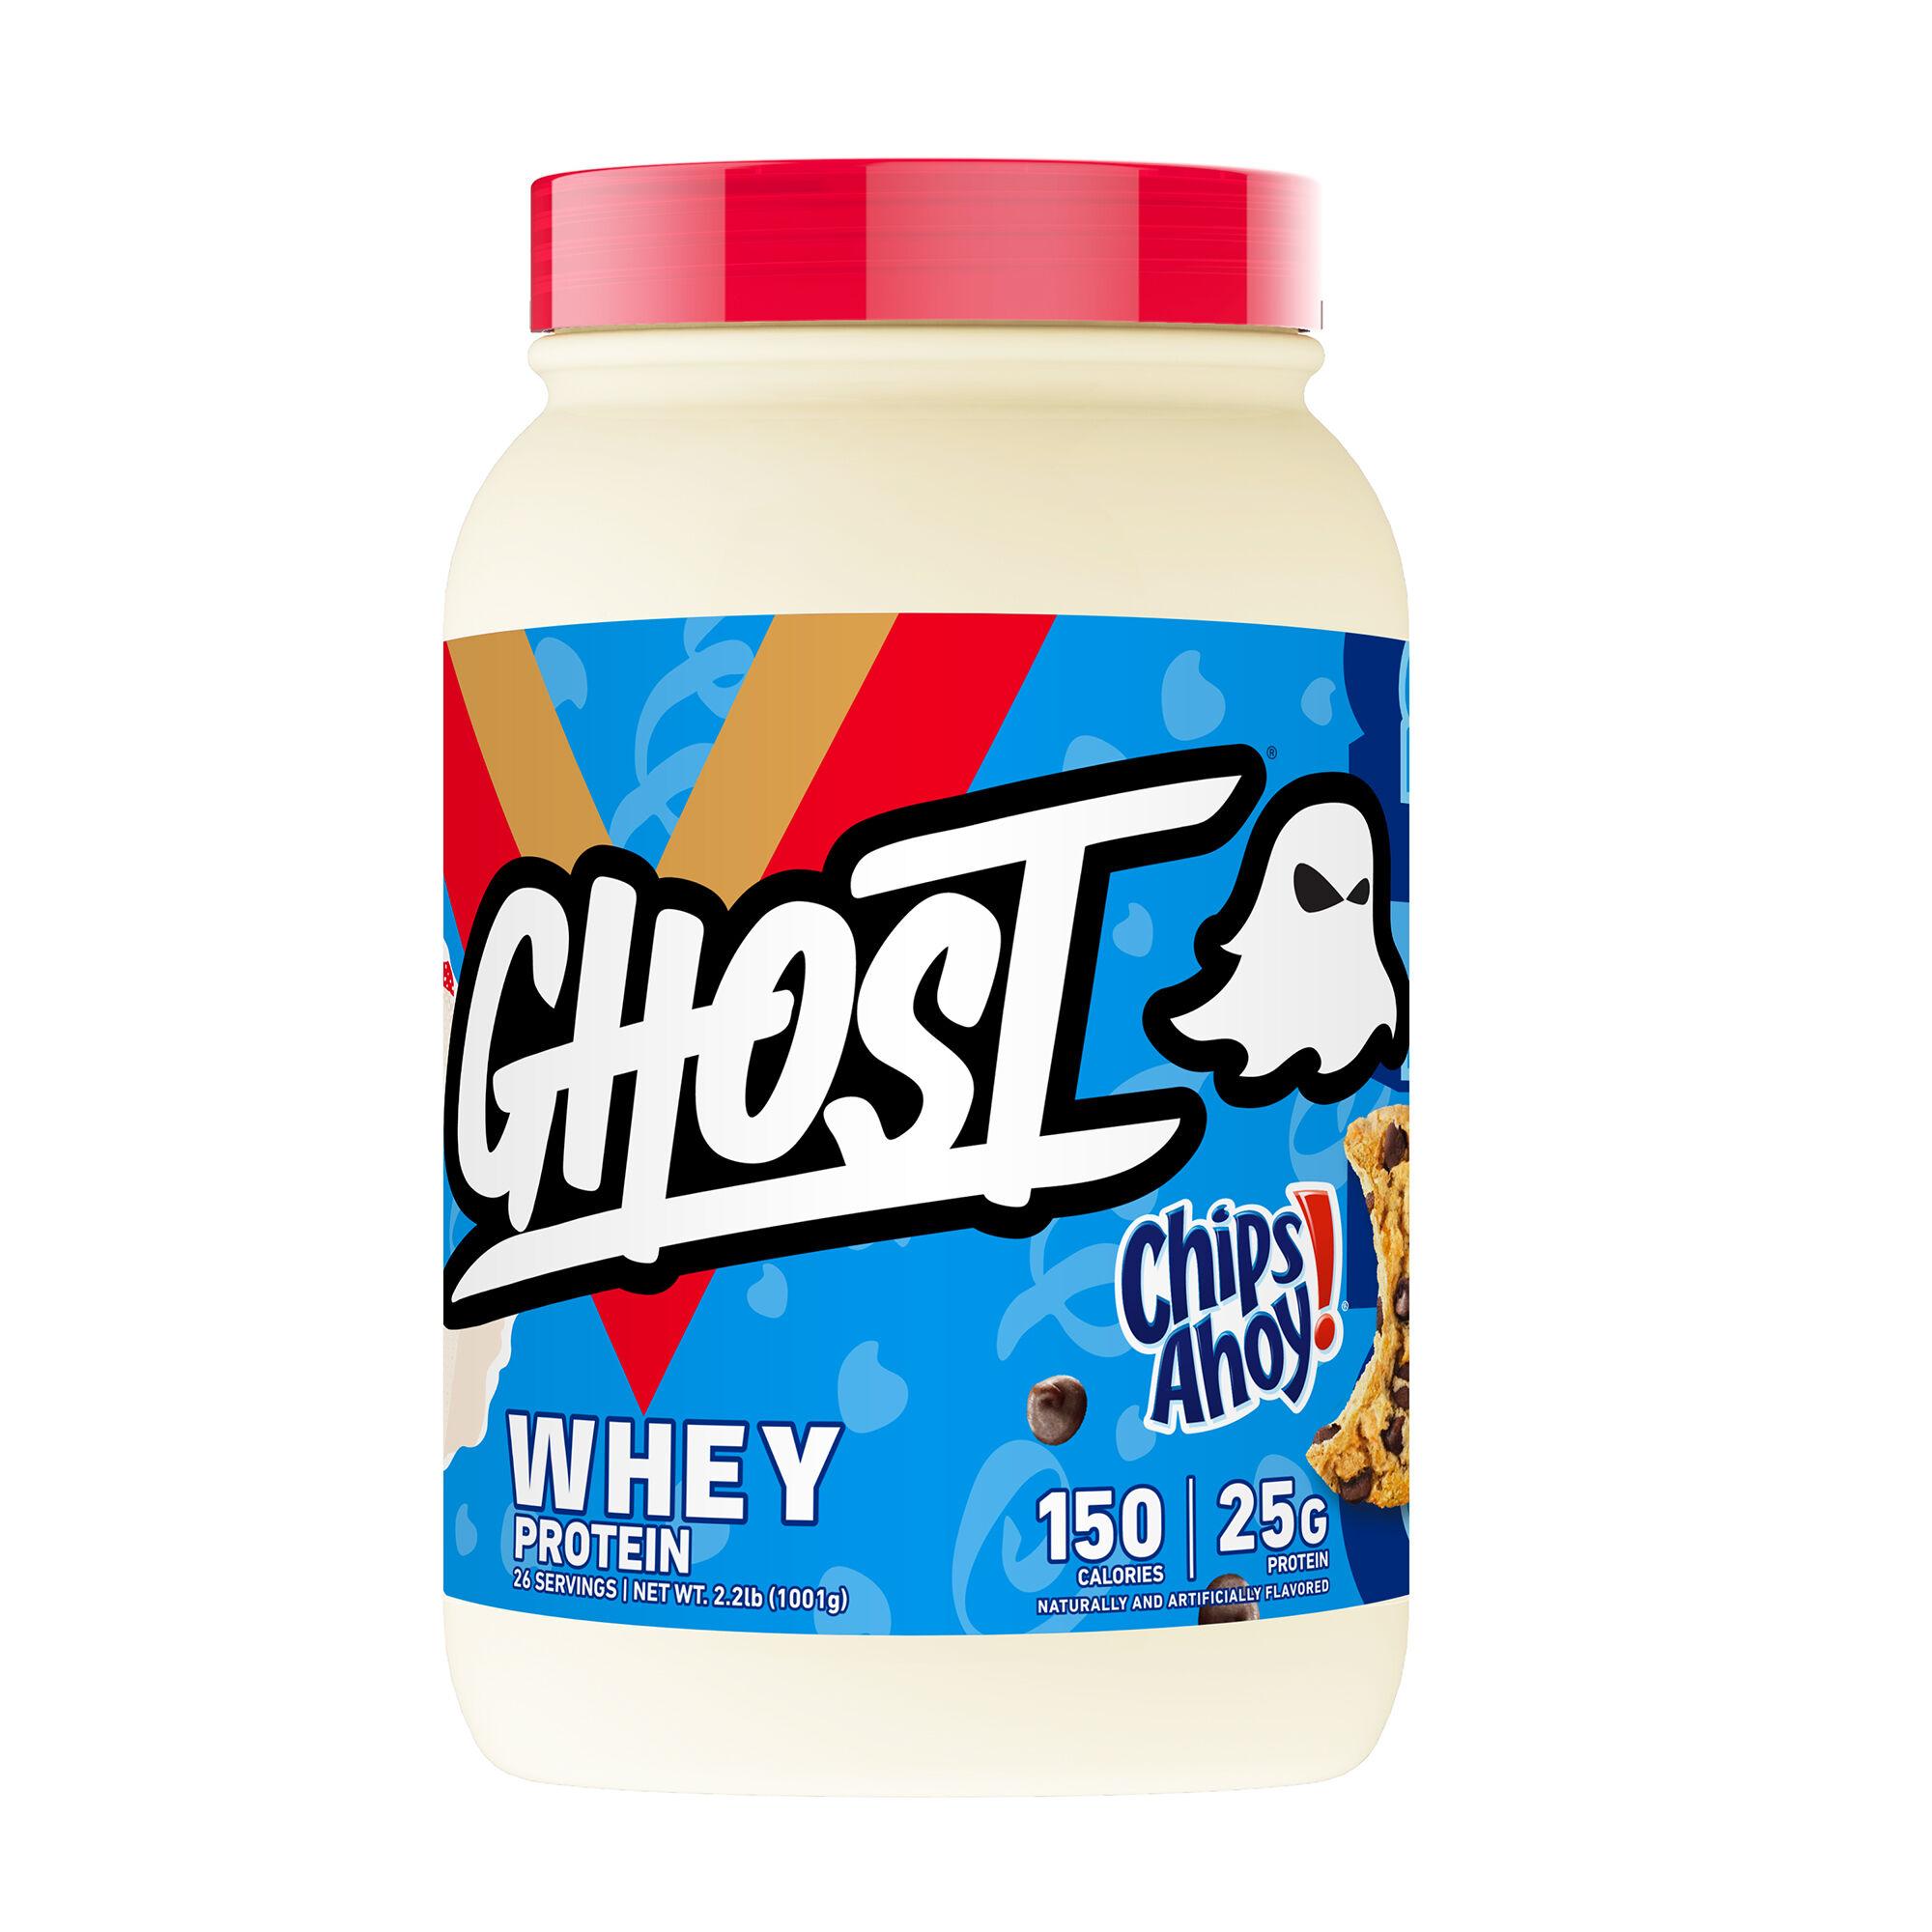 WHEY - Chips Ahoy!®